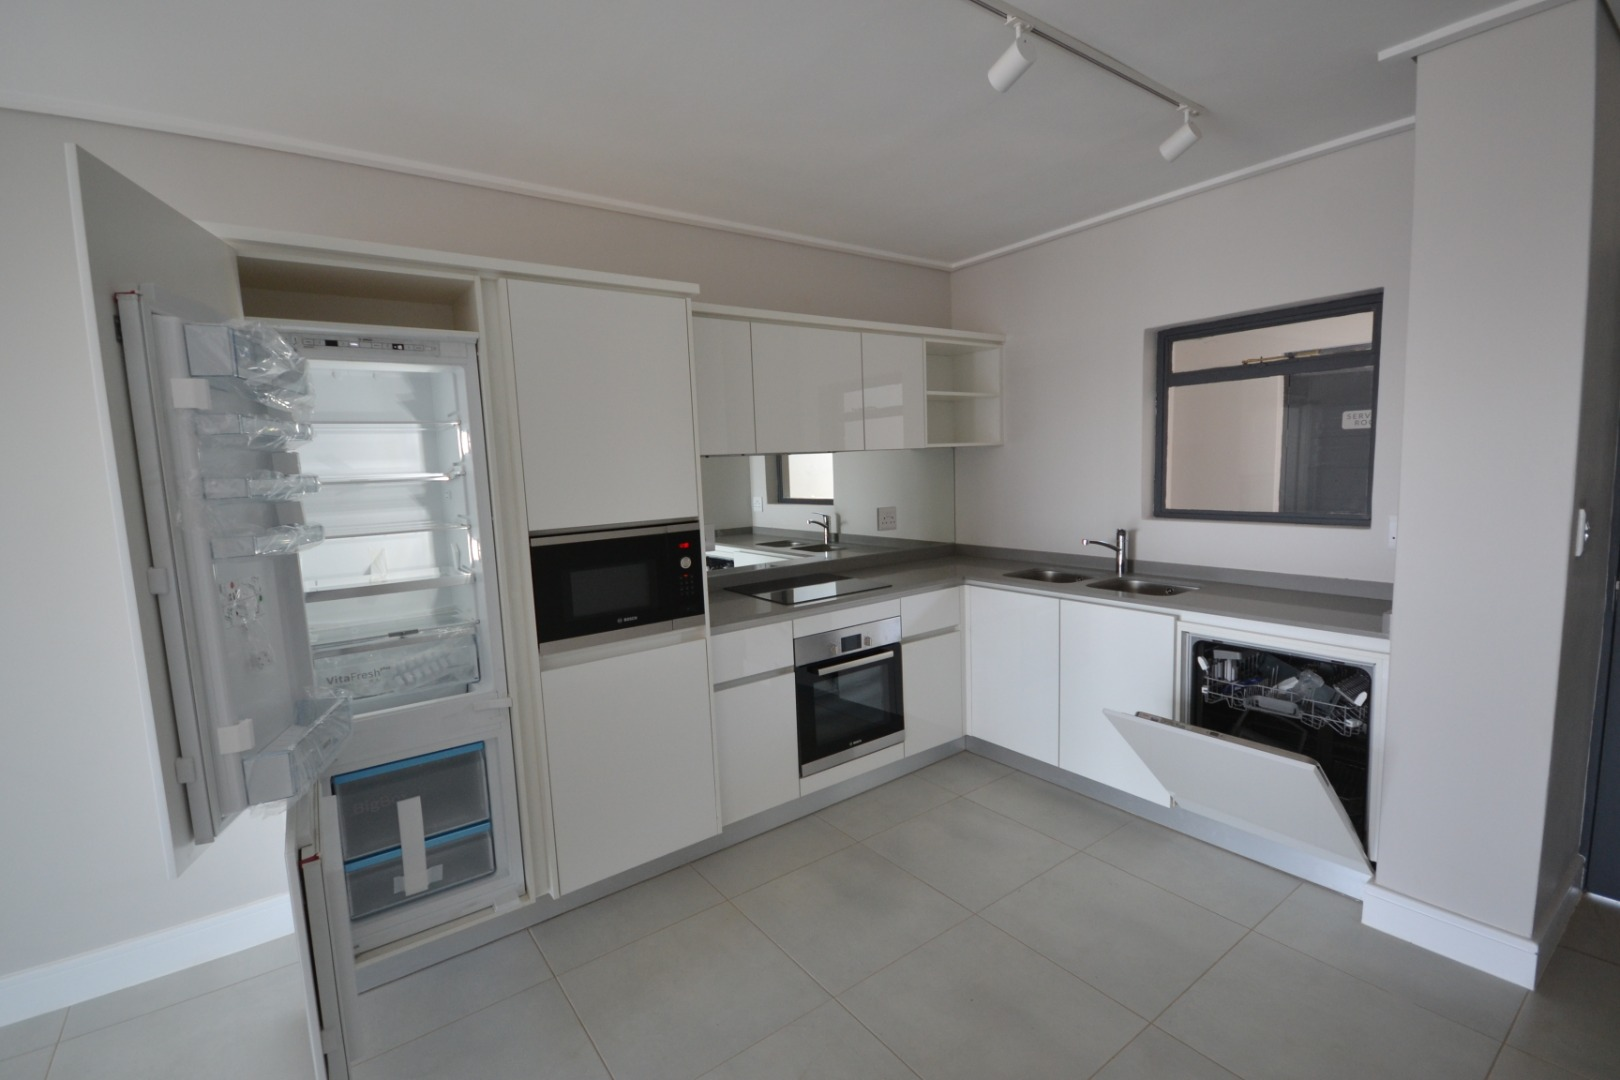 2 Bedroom Apartment / Flat To Rent in Eikenhof